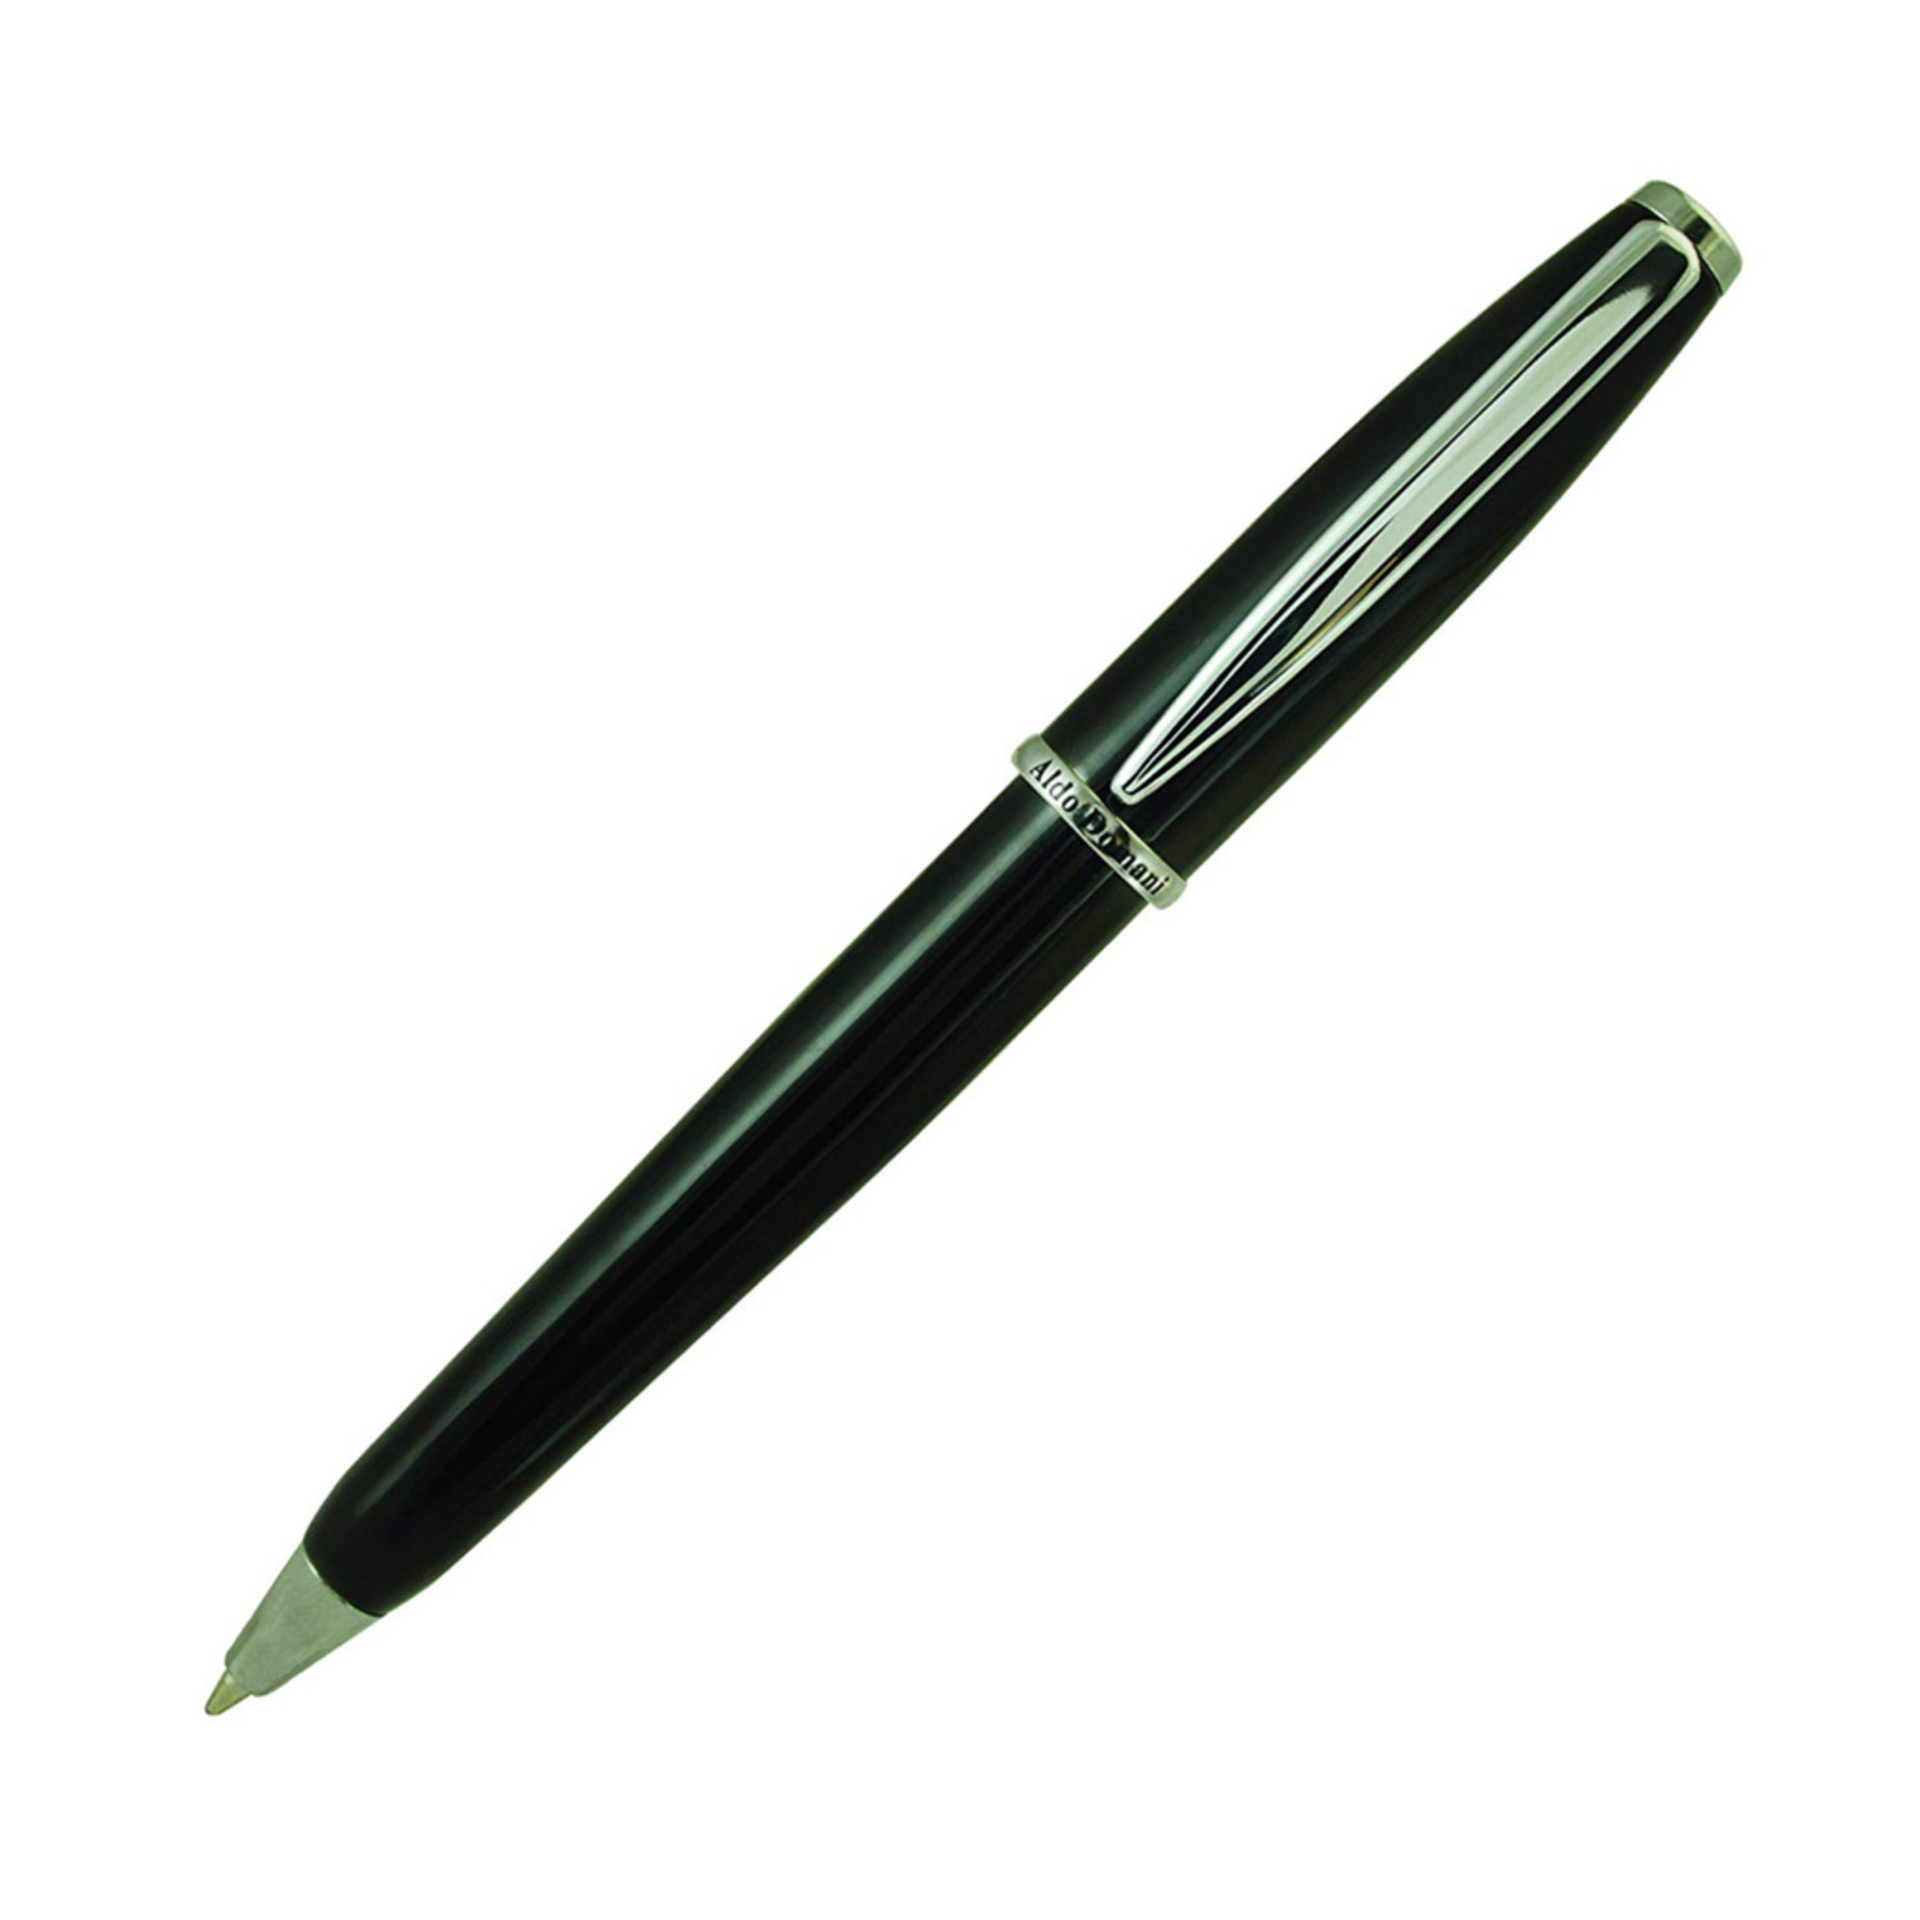 Monteverde Aldo Domani Ballpoint Pen Black